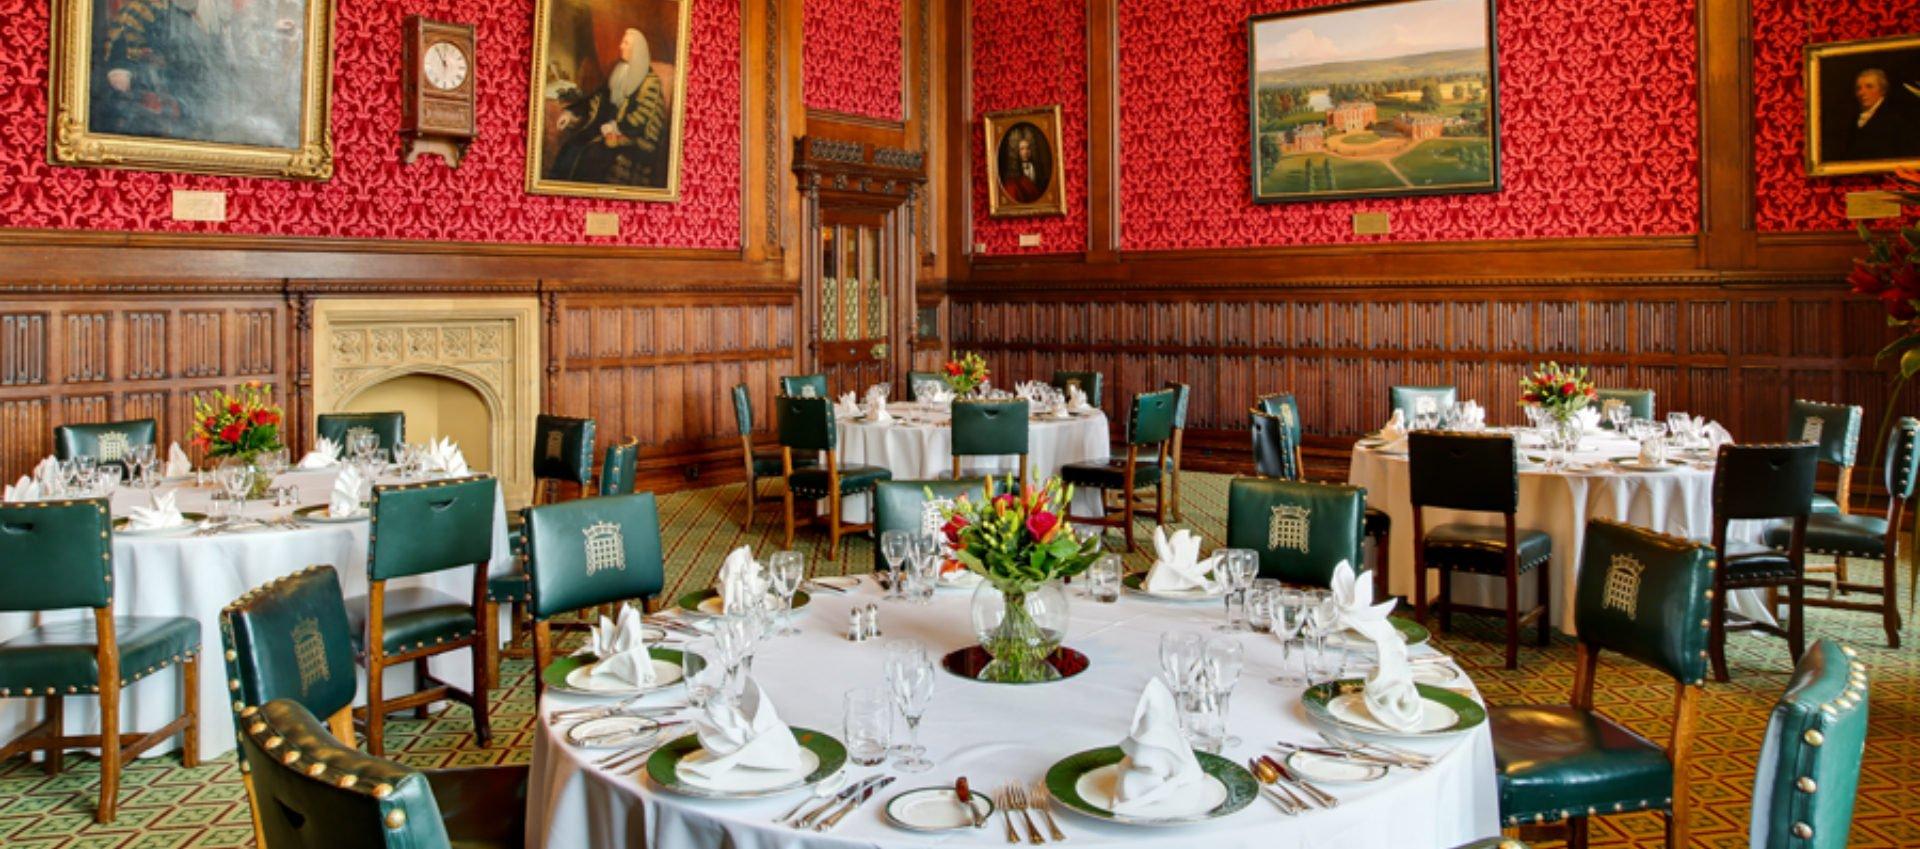 Restaurant At Parliament House